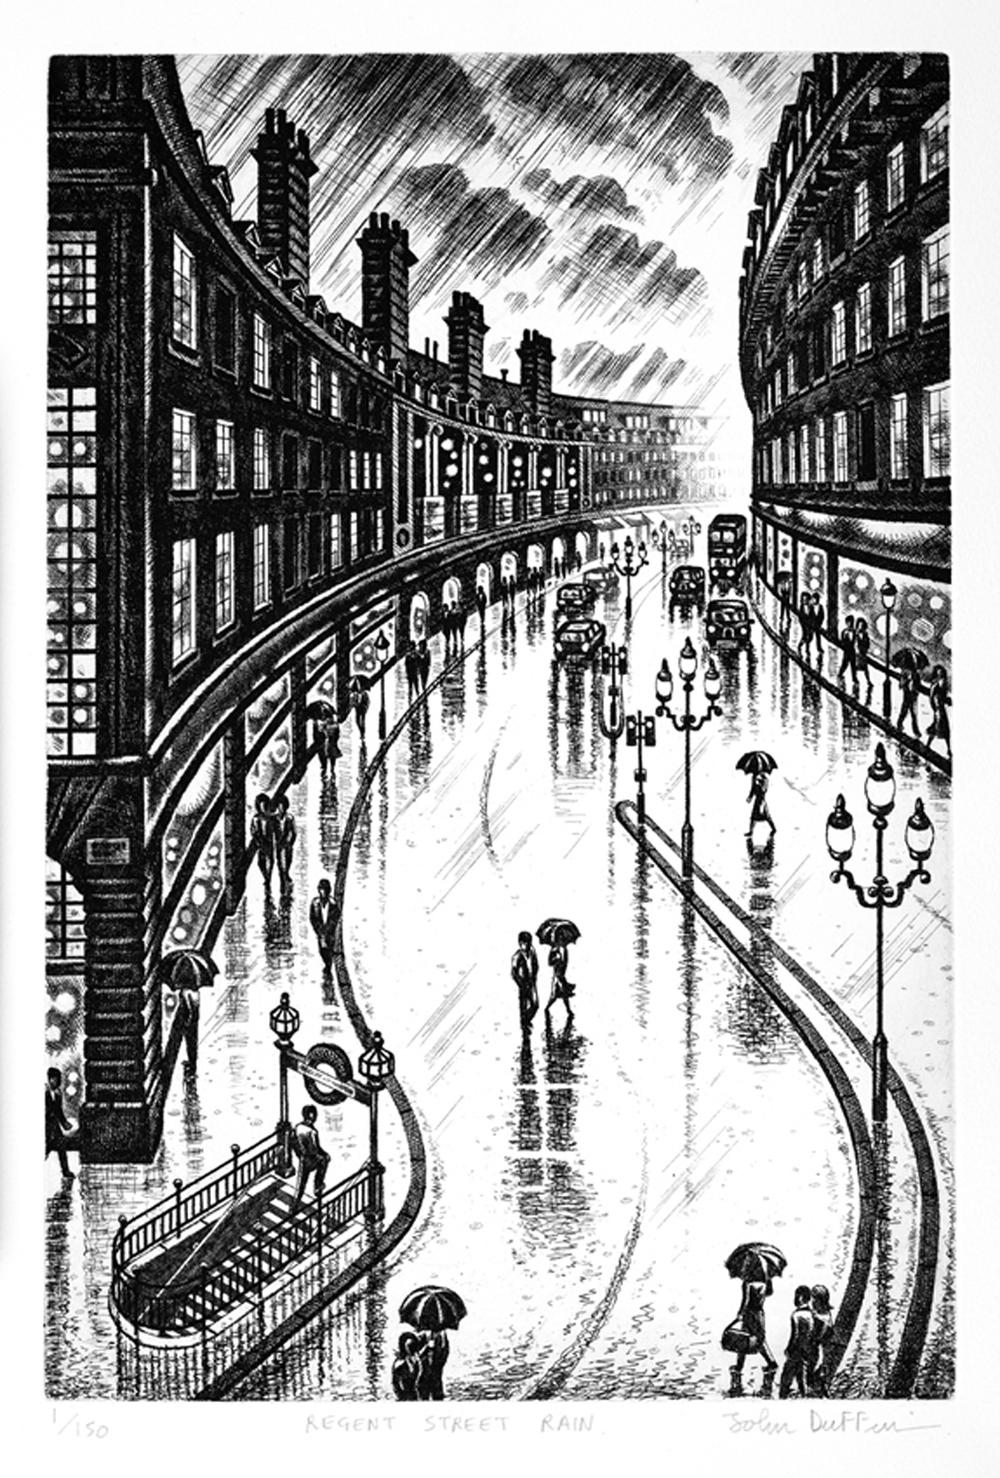 Regent Street Rain etching